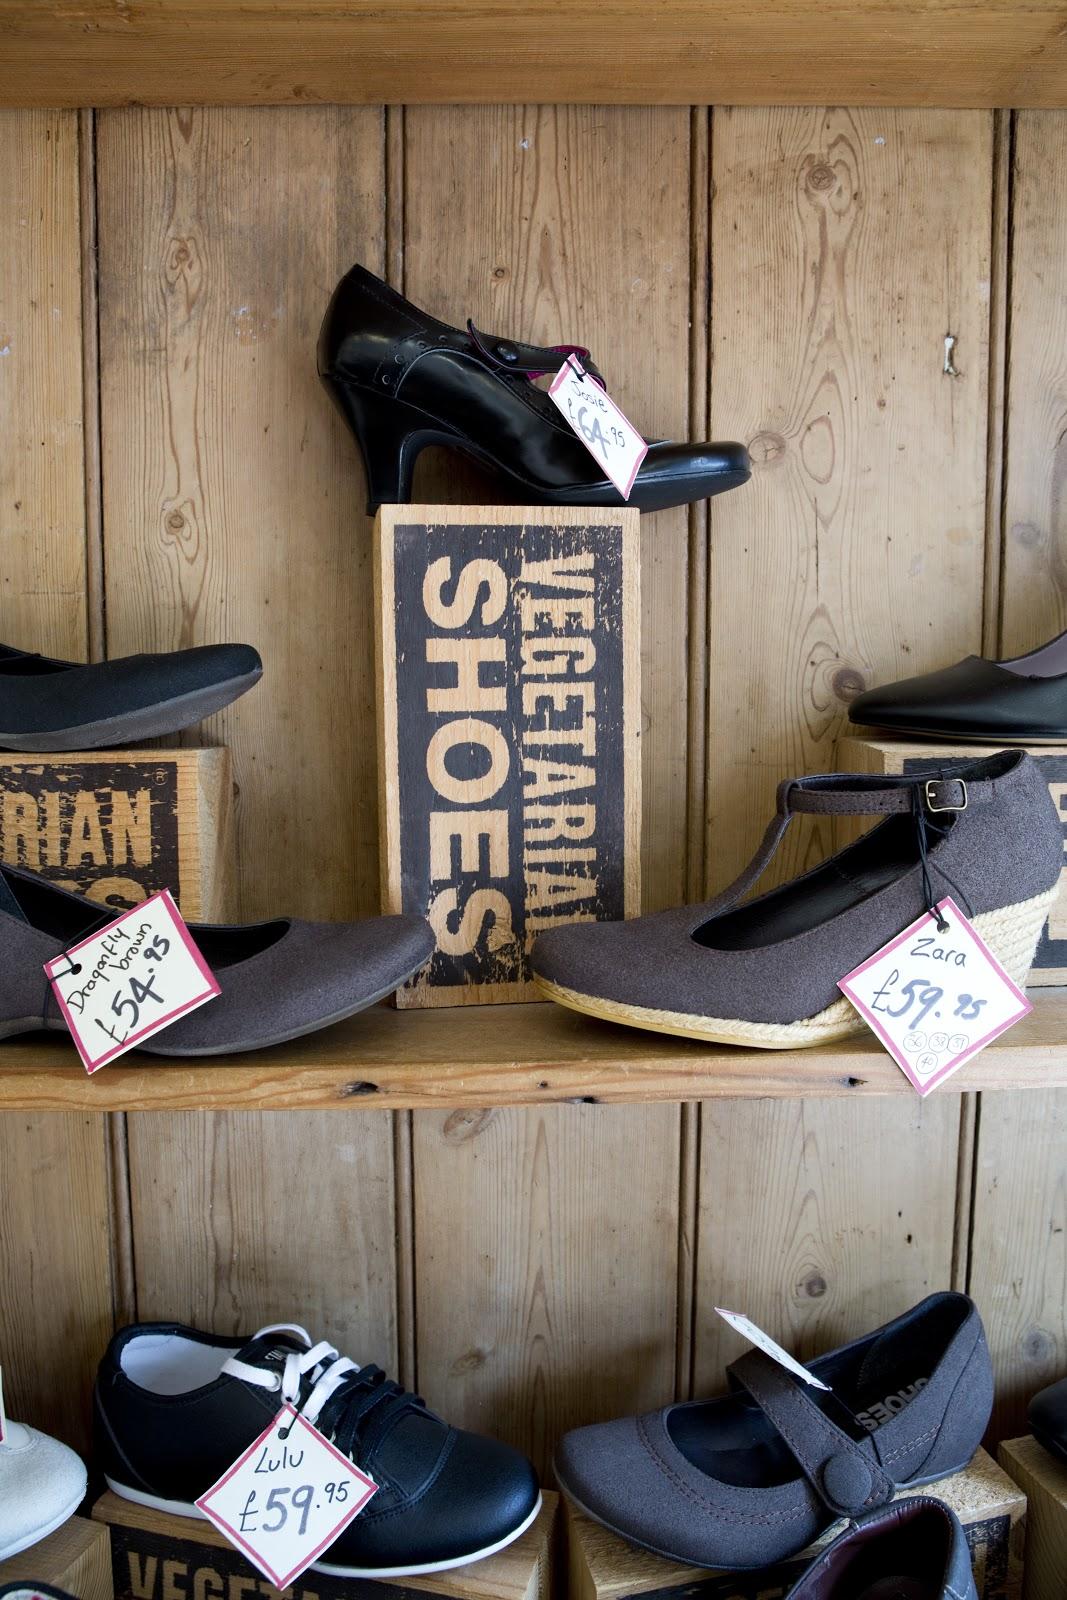 Collingwood Vegan Shoe Shop